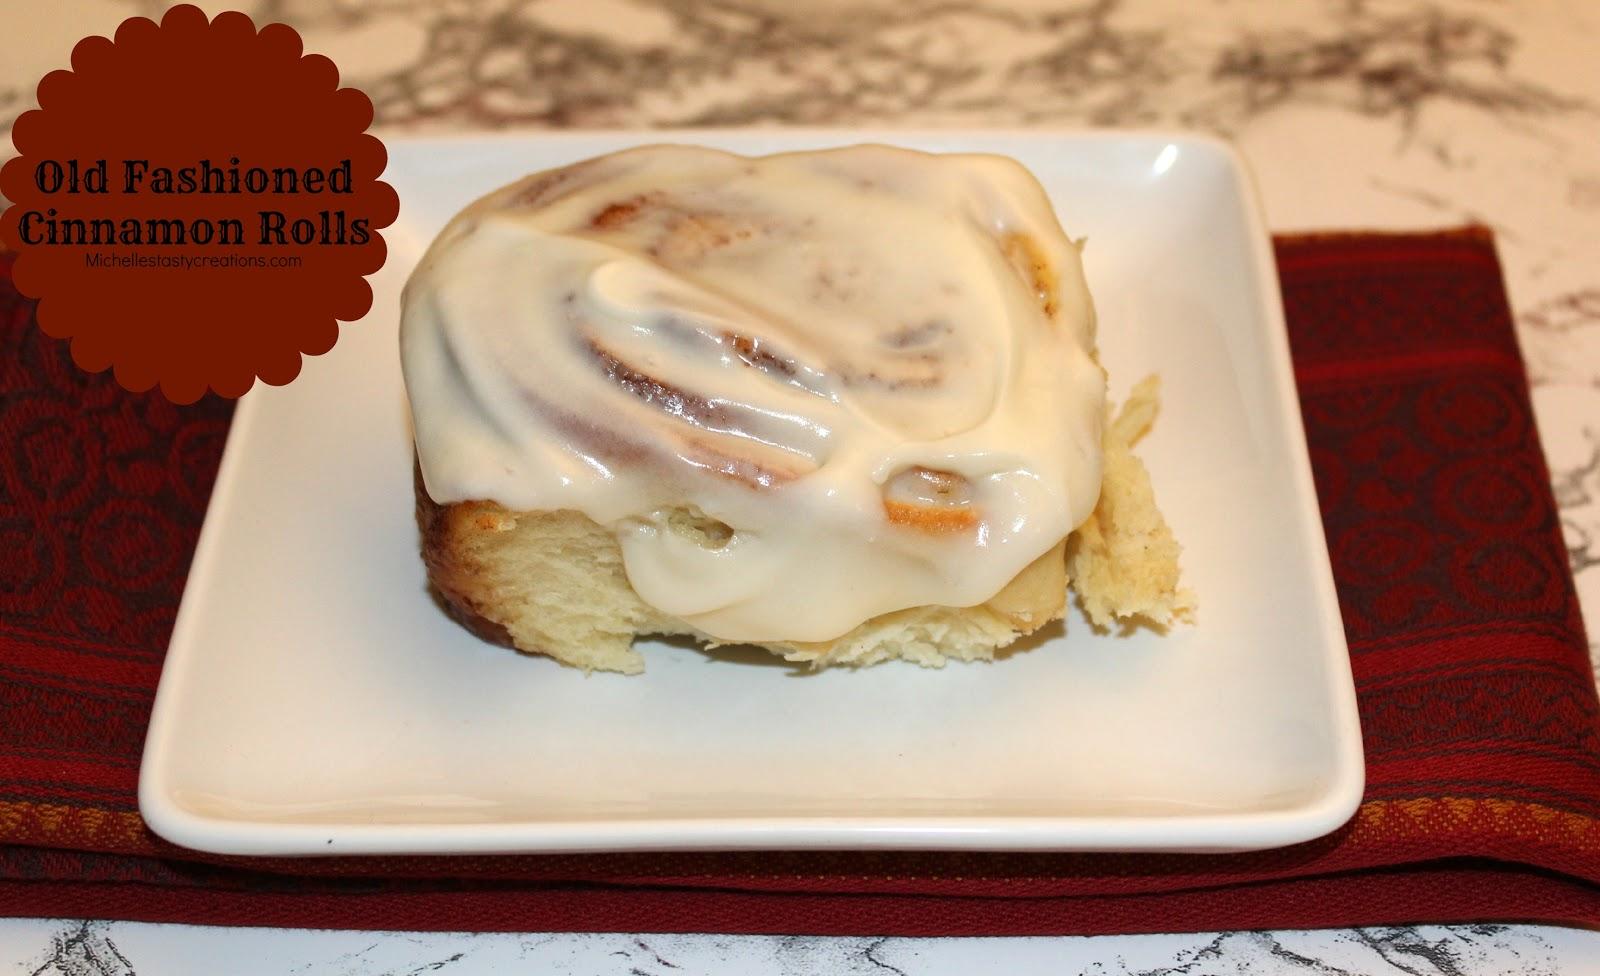 ... Tasty Creations: Old Fashioned Cinnamon Rolls {Recipe Re-do